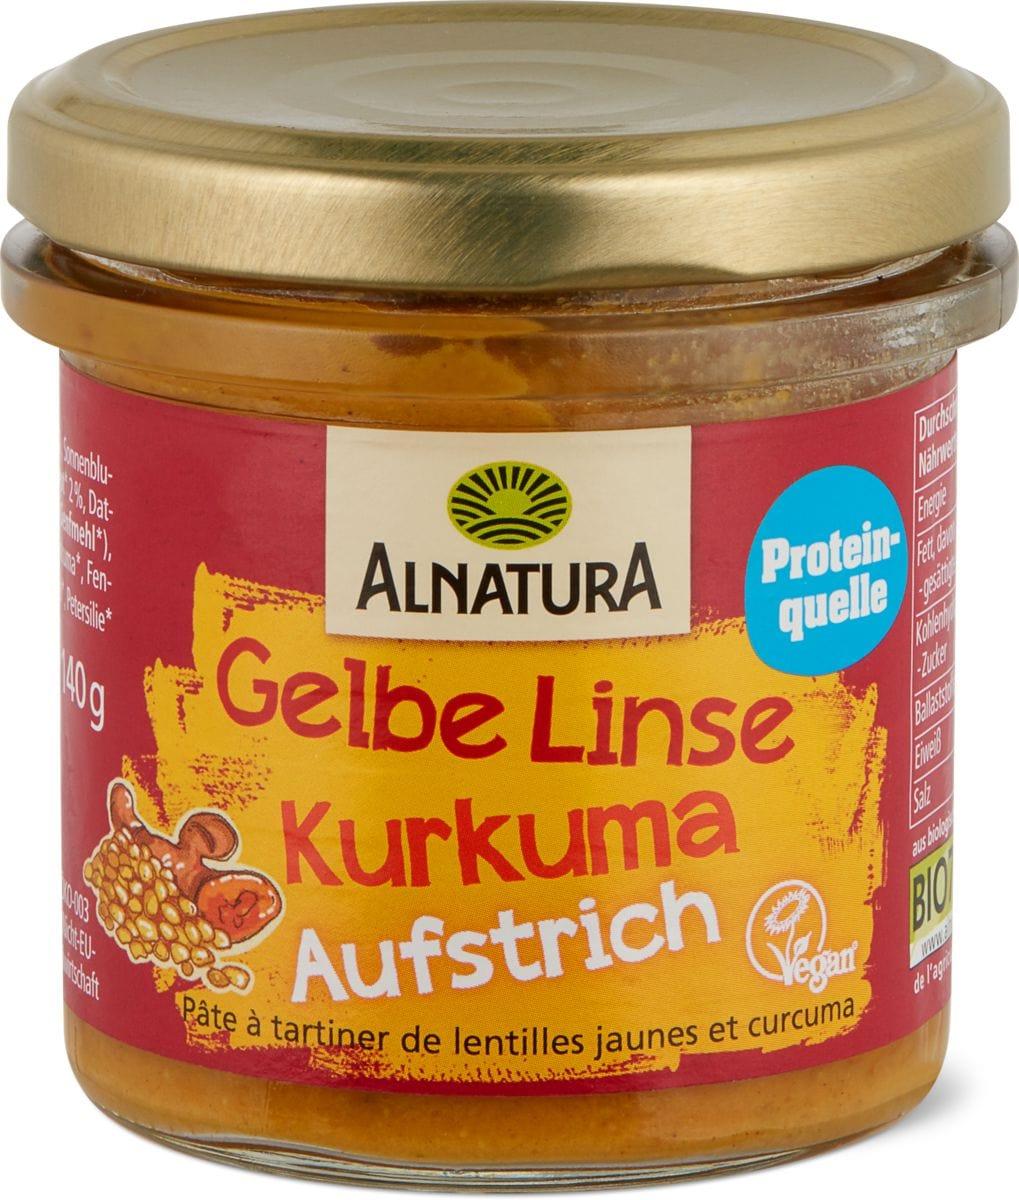 ALNATURA AUFSTRICH GELBE LINSE KURKUMA